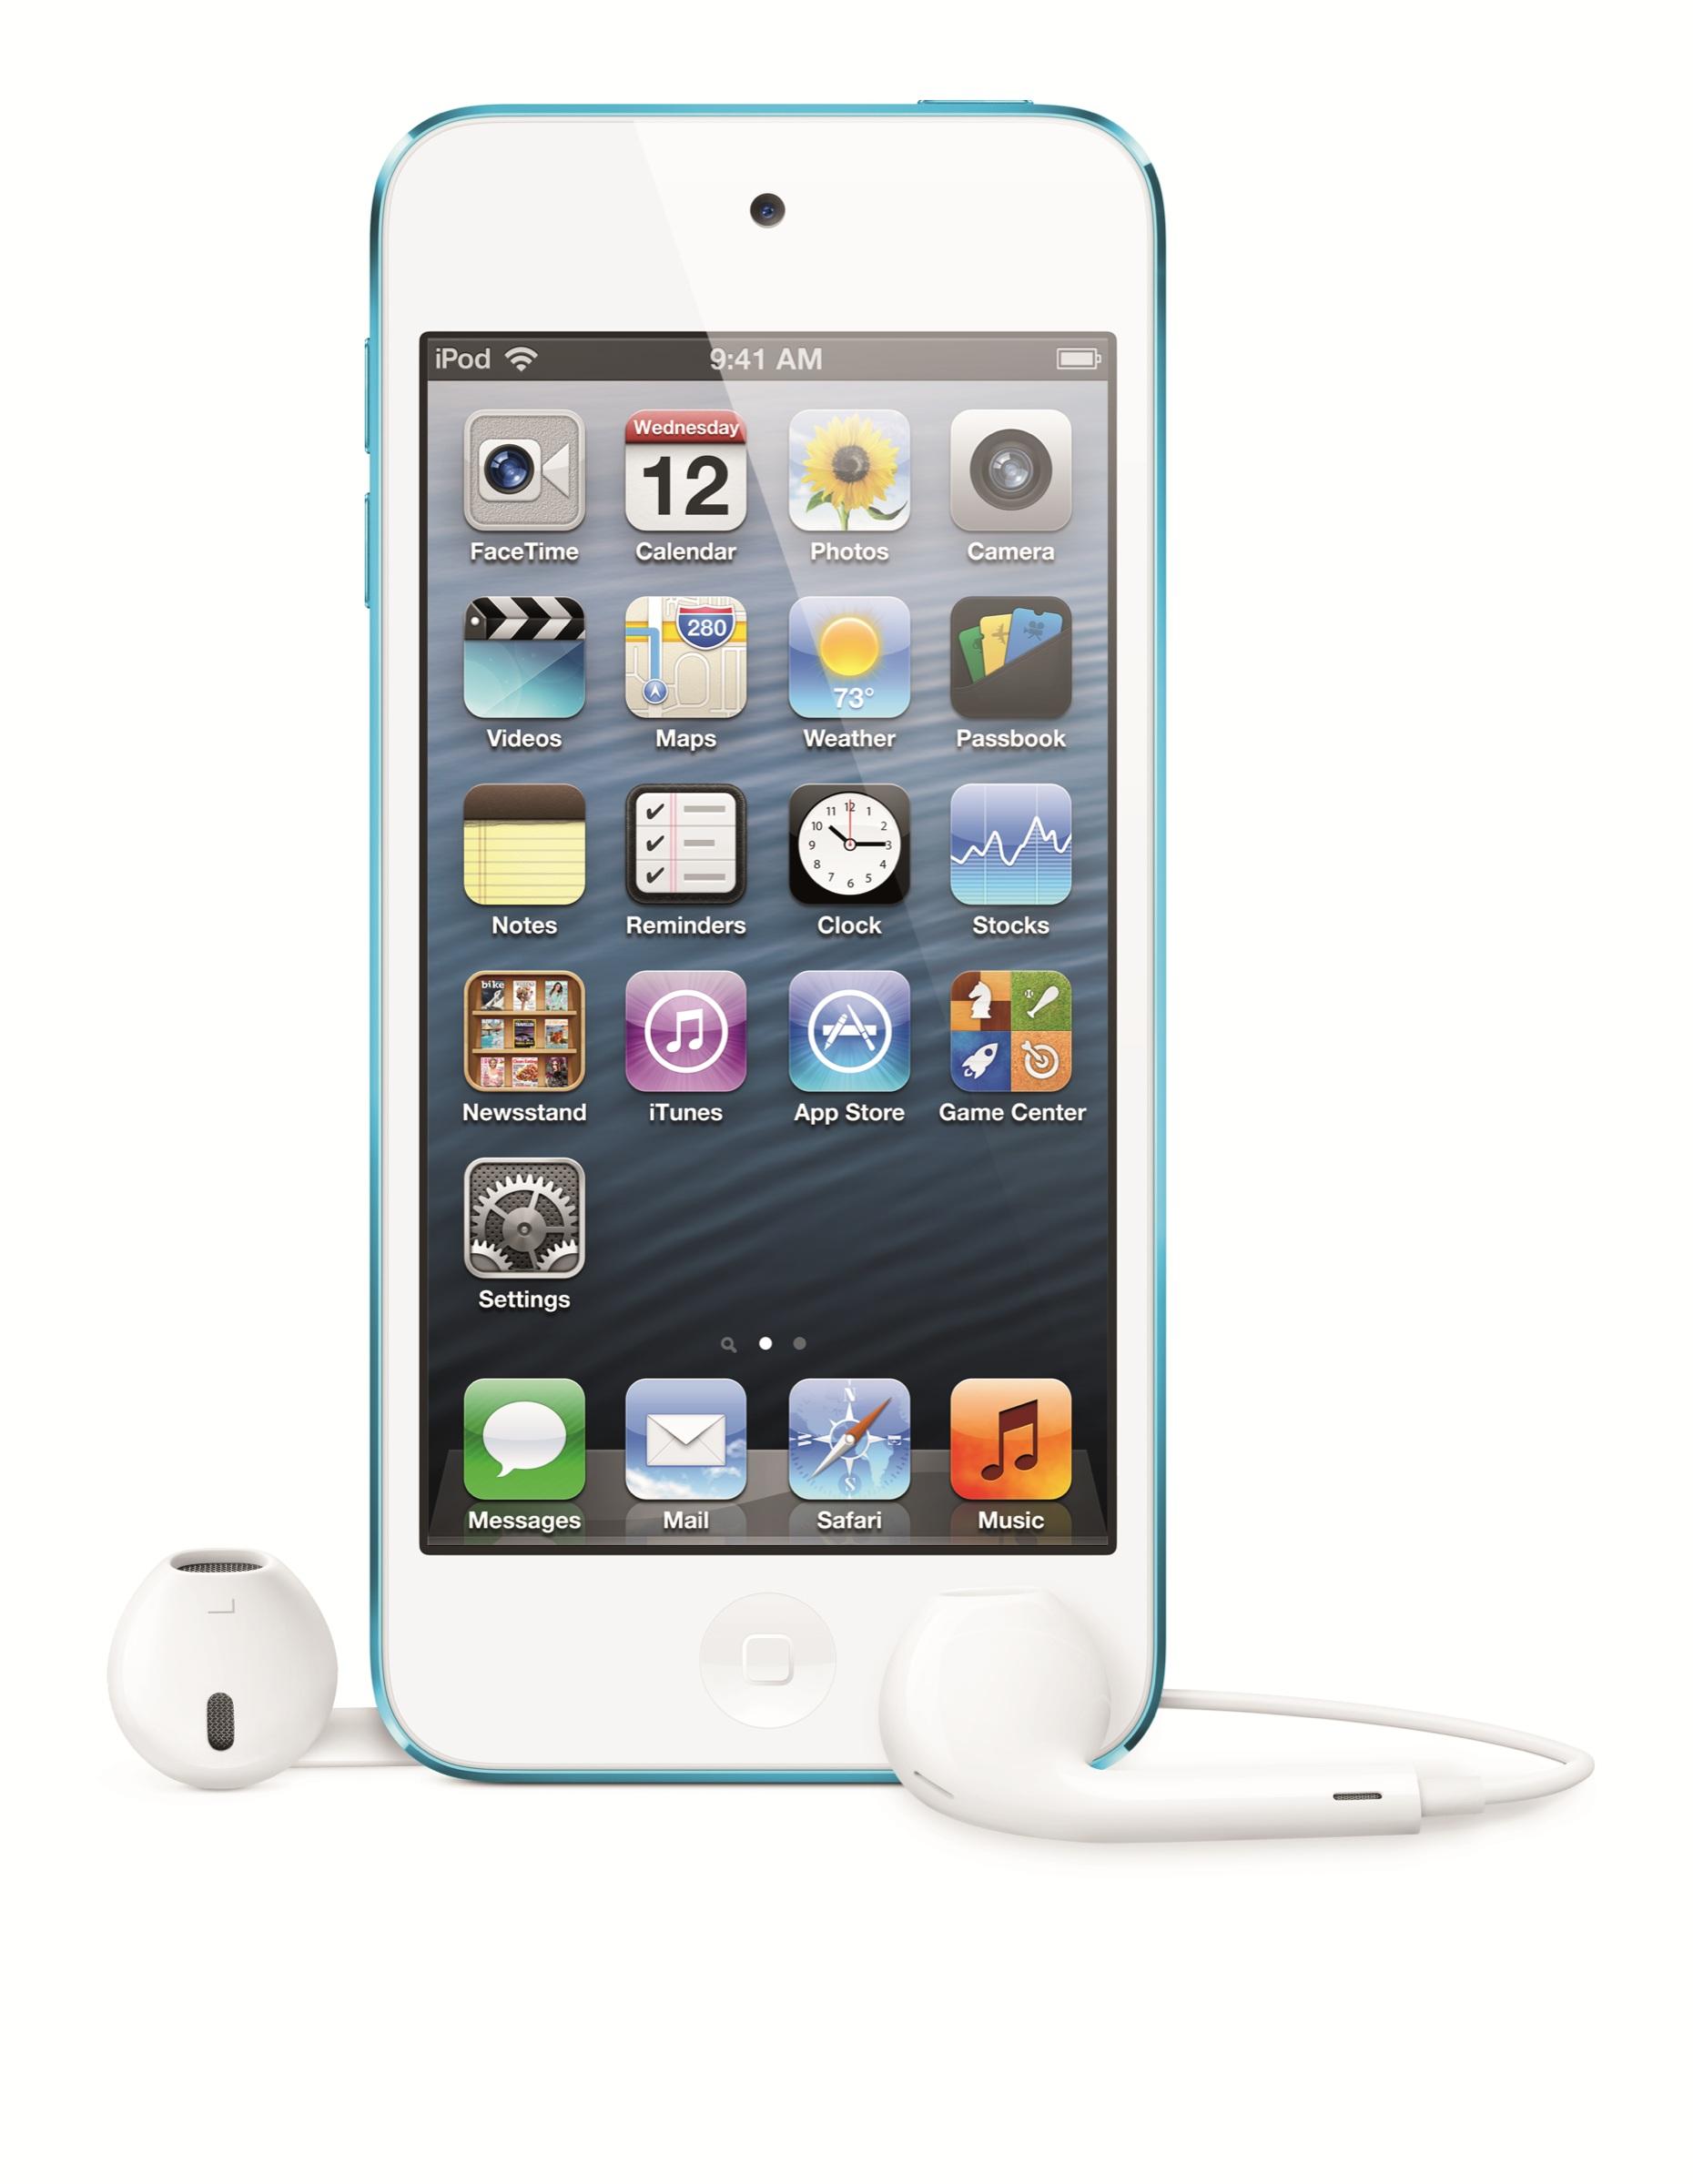 » iPod Nano 7G, Touch 5G, EarPods Tek4.ME